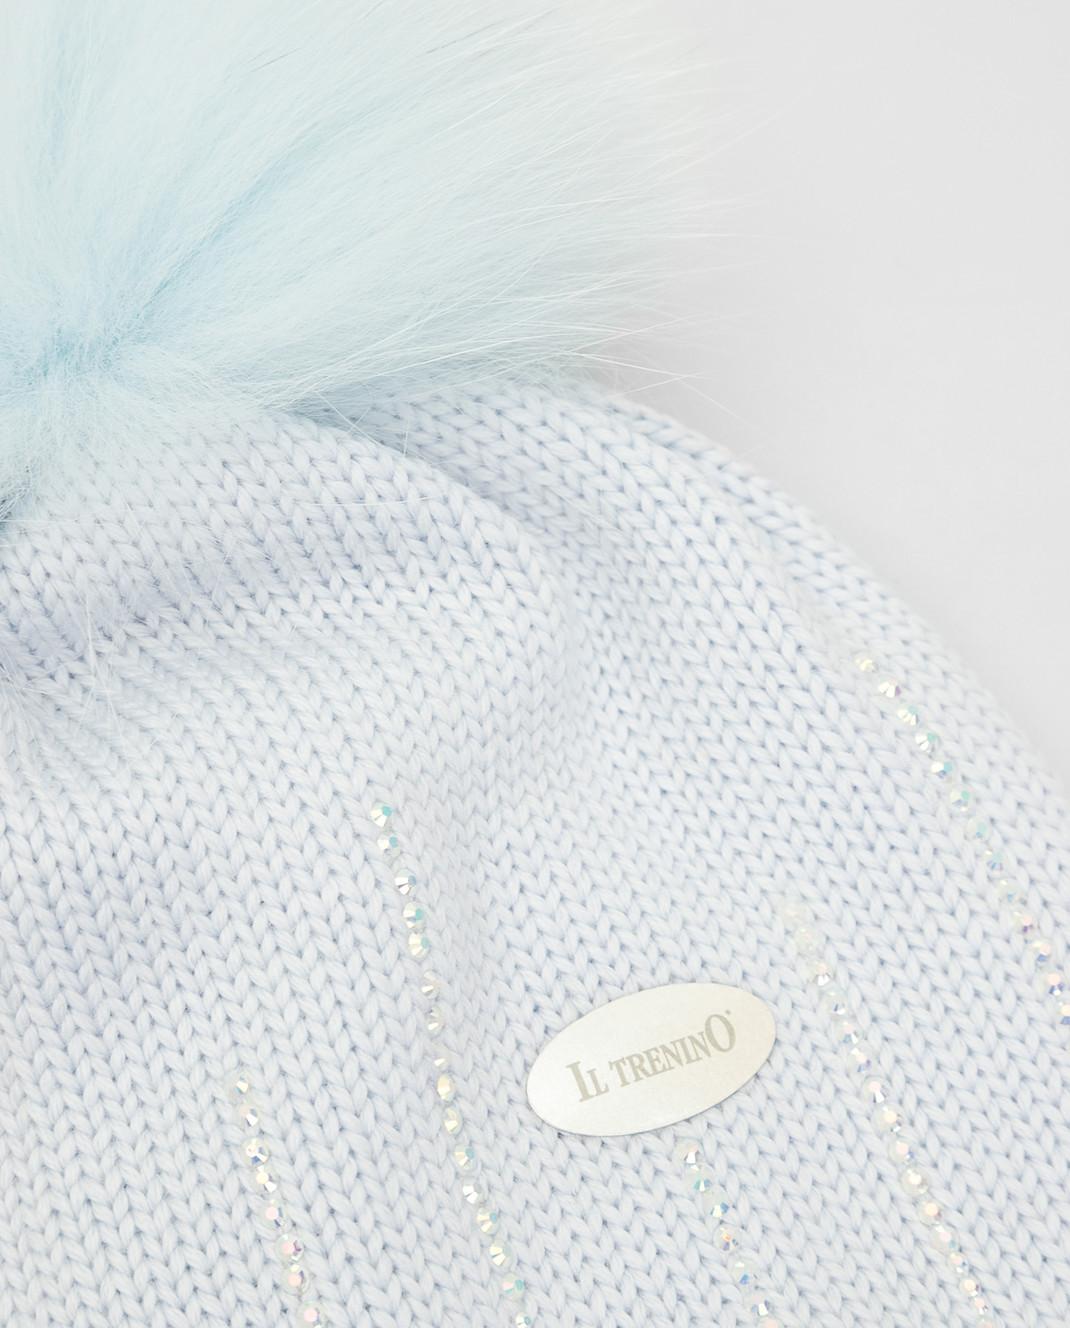 Il Trenino Детская голубая шапка из шерсти изображение 3